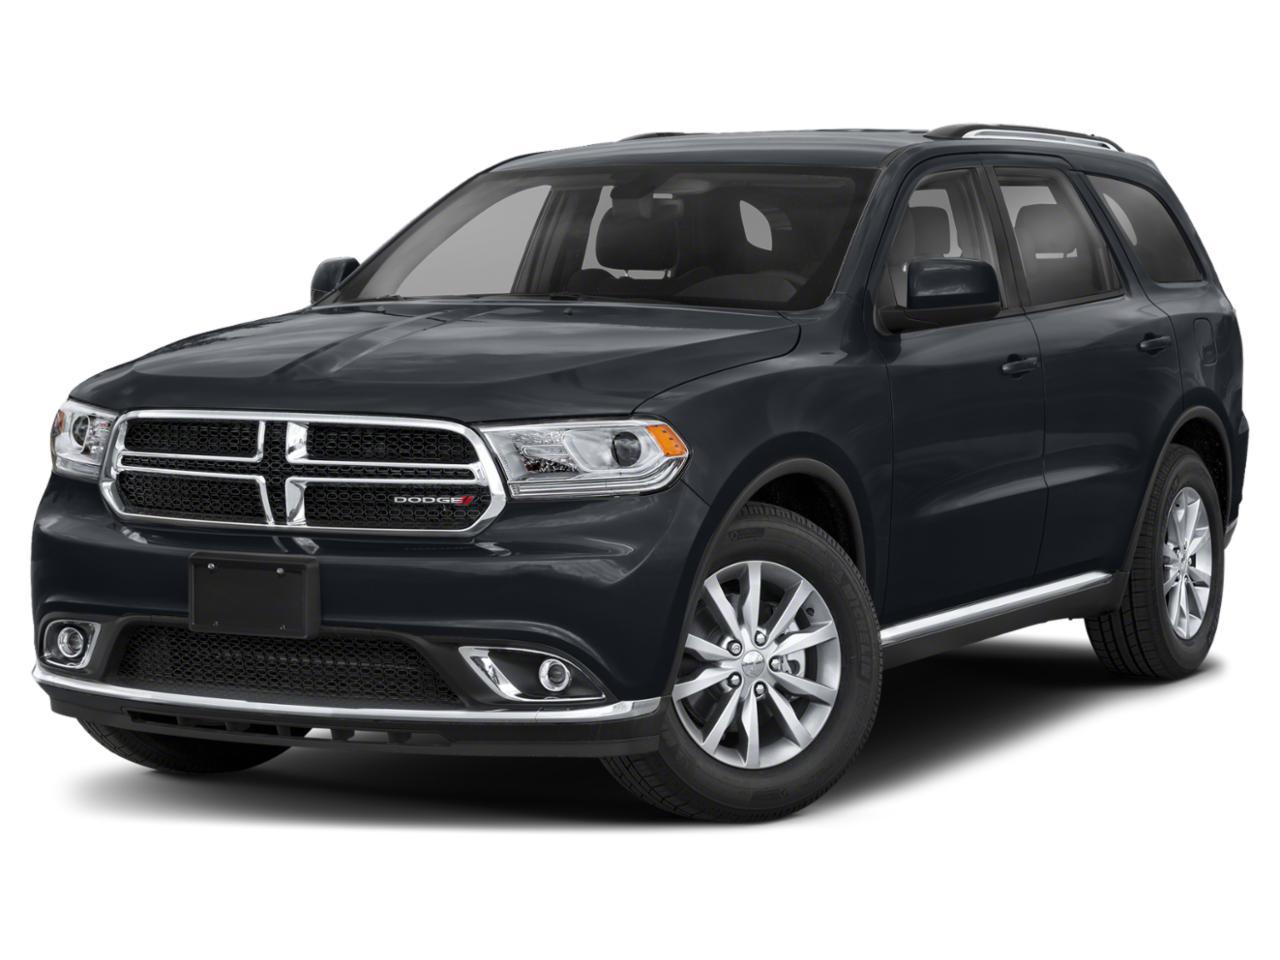 2018 Dodge Durango Vehicle Photo in TERRYVILLE, CT 06786-5904